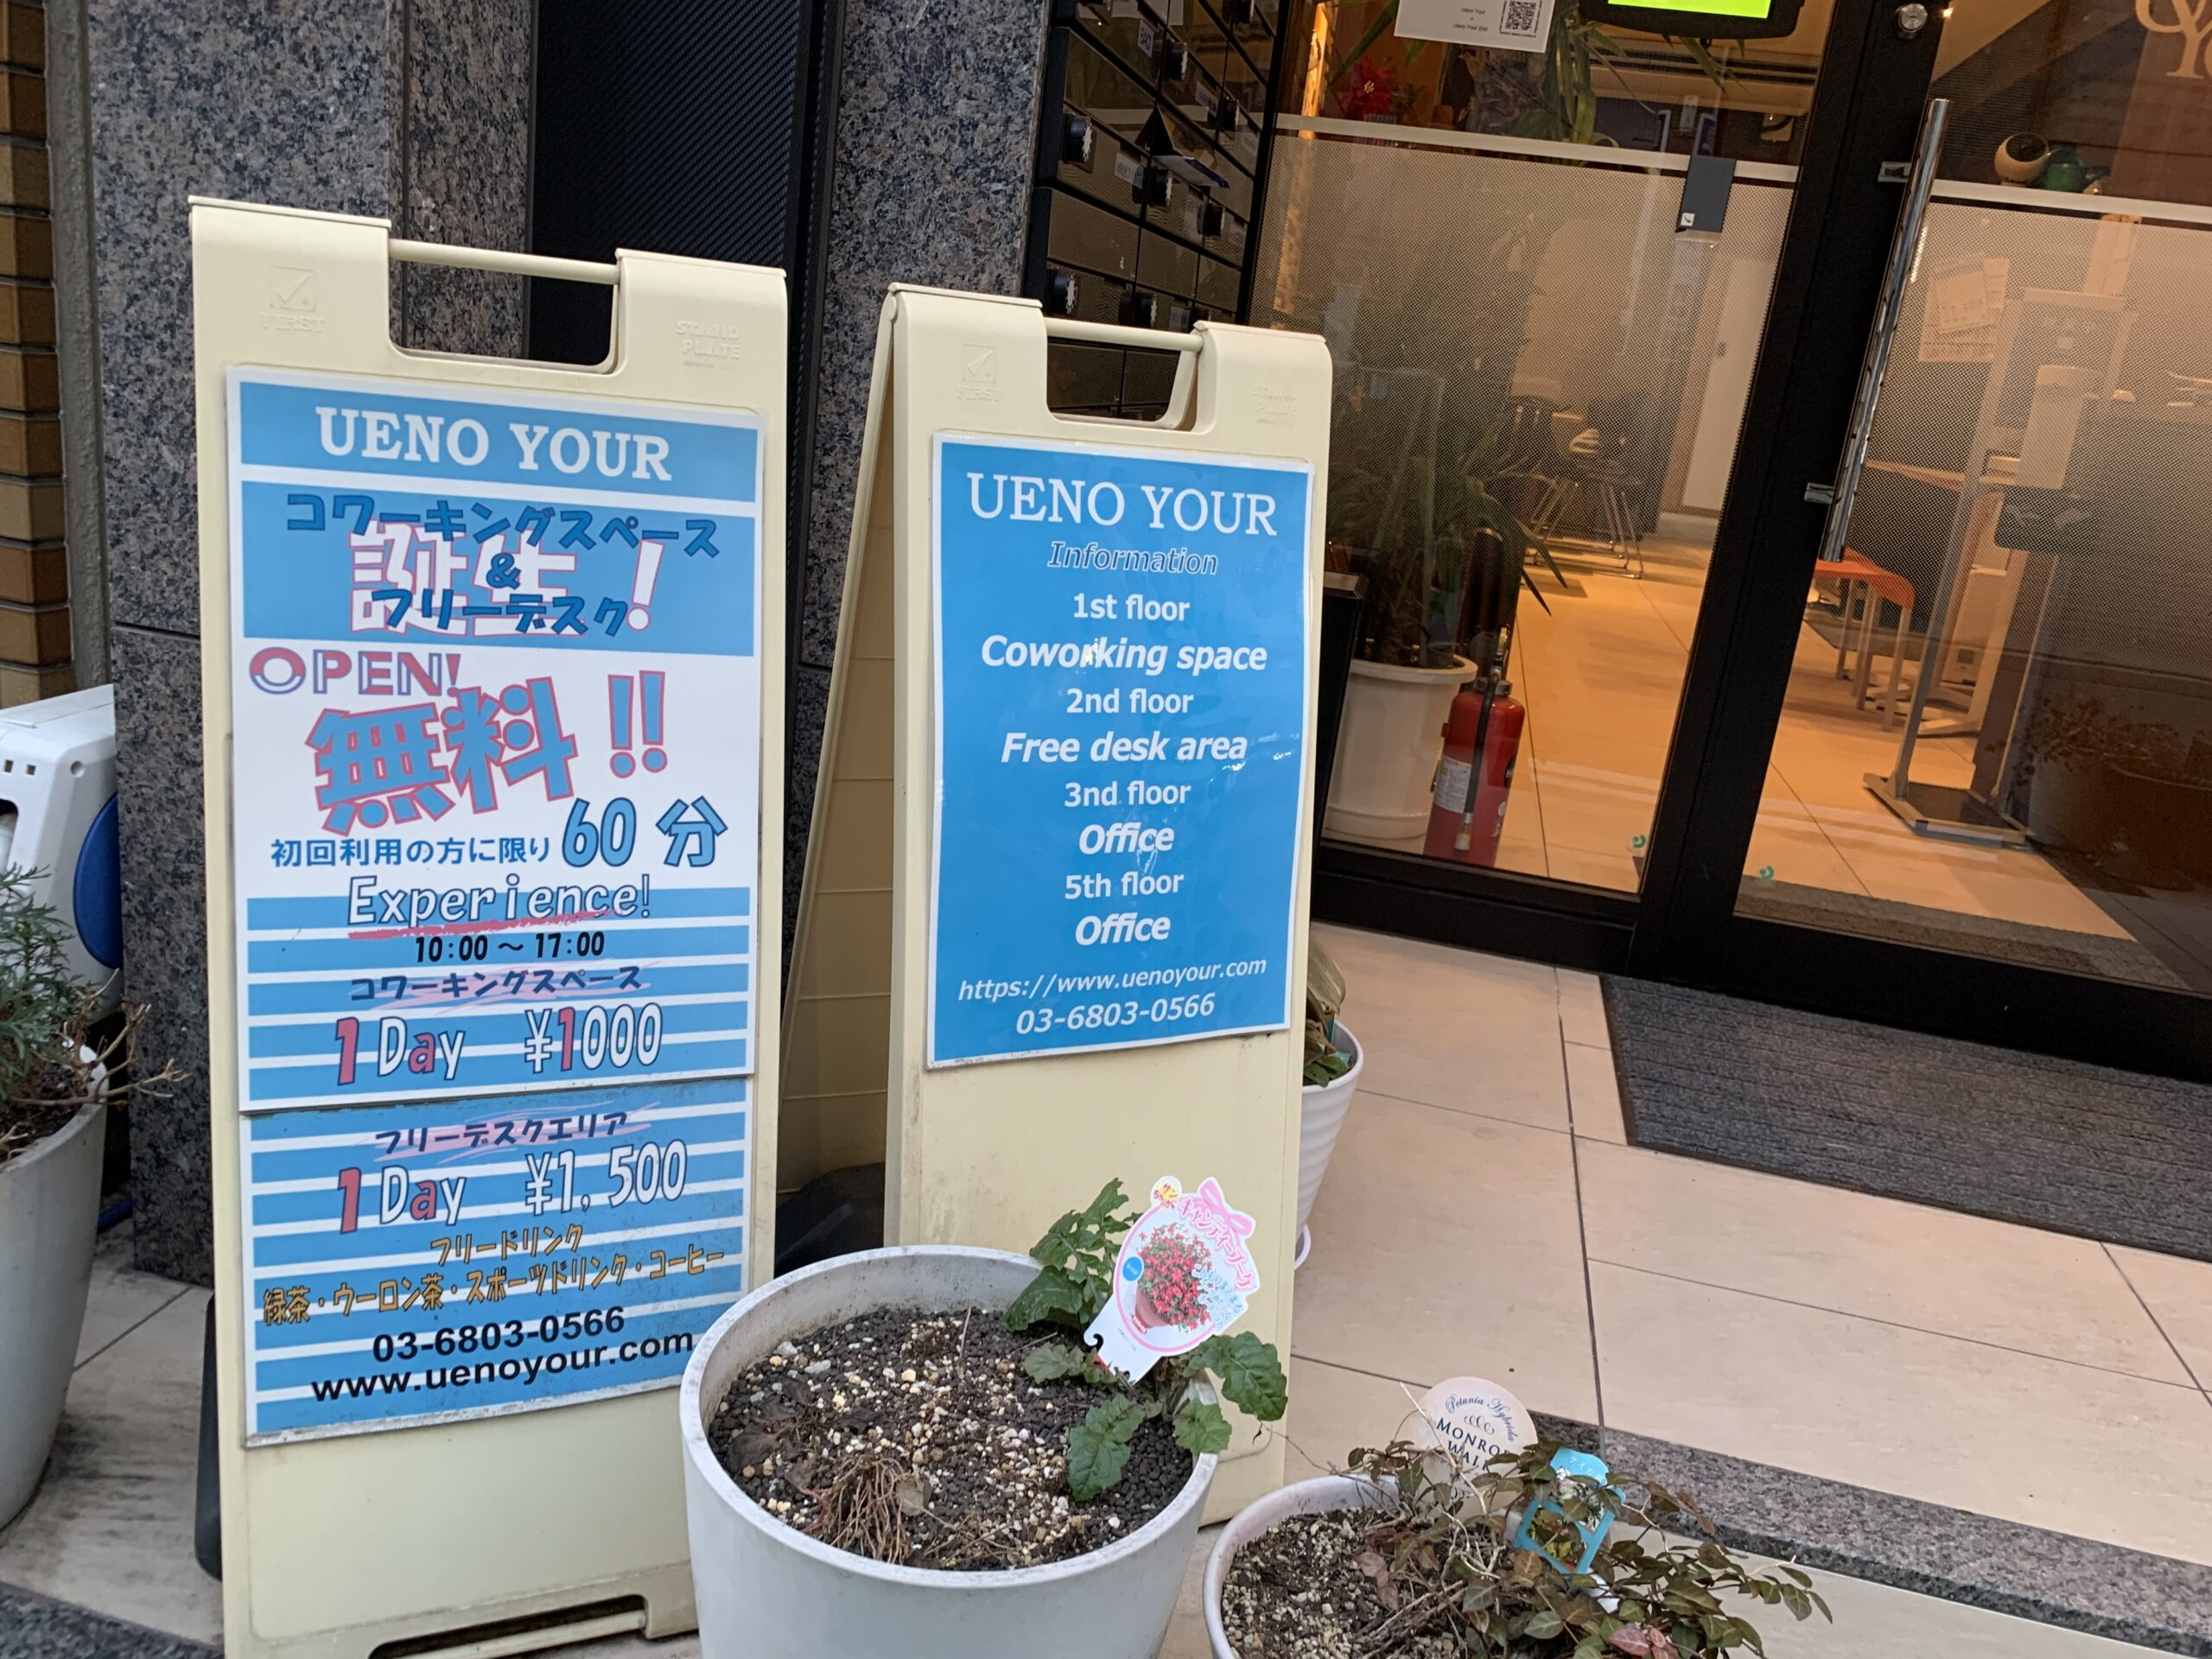 御徒町駅南口 Ueno Your Wi-Fi